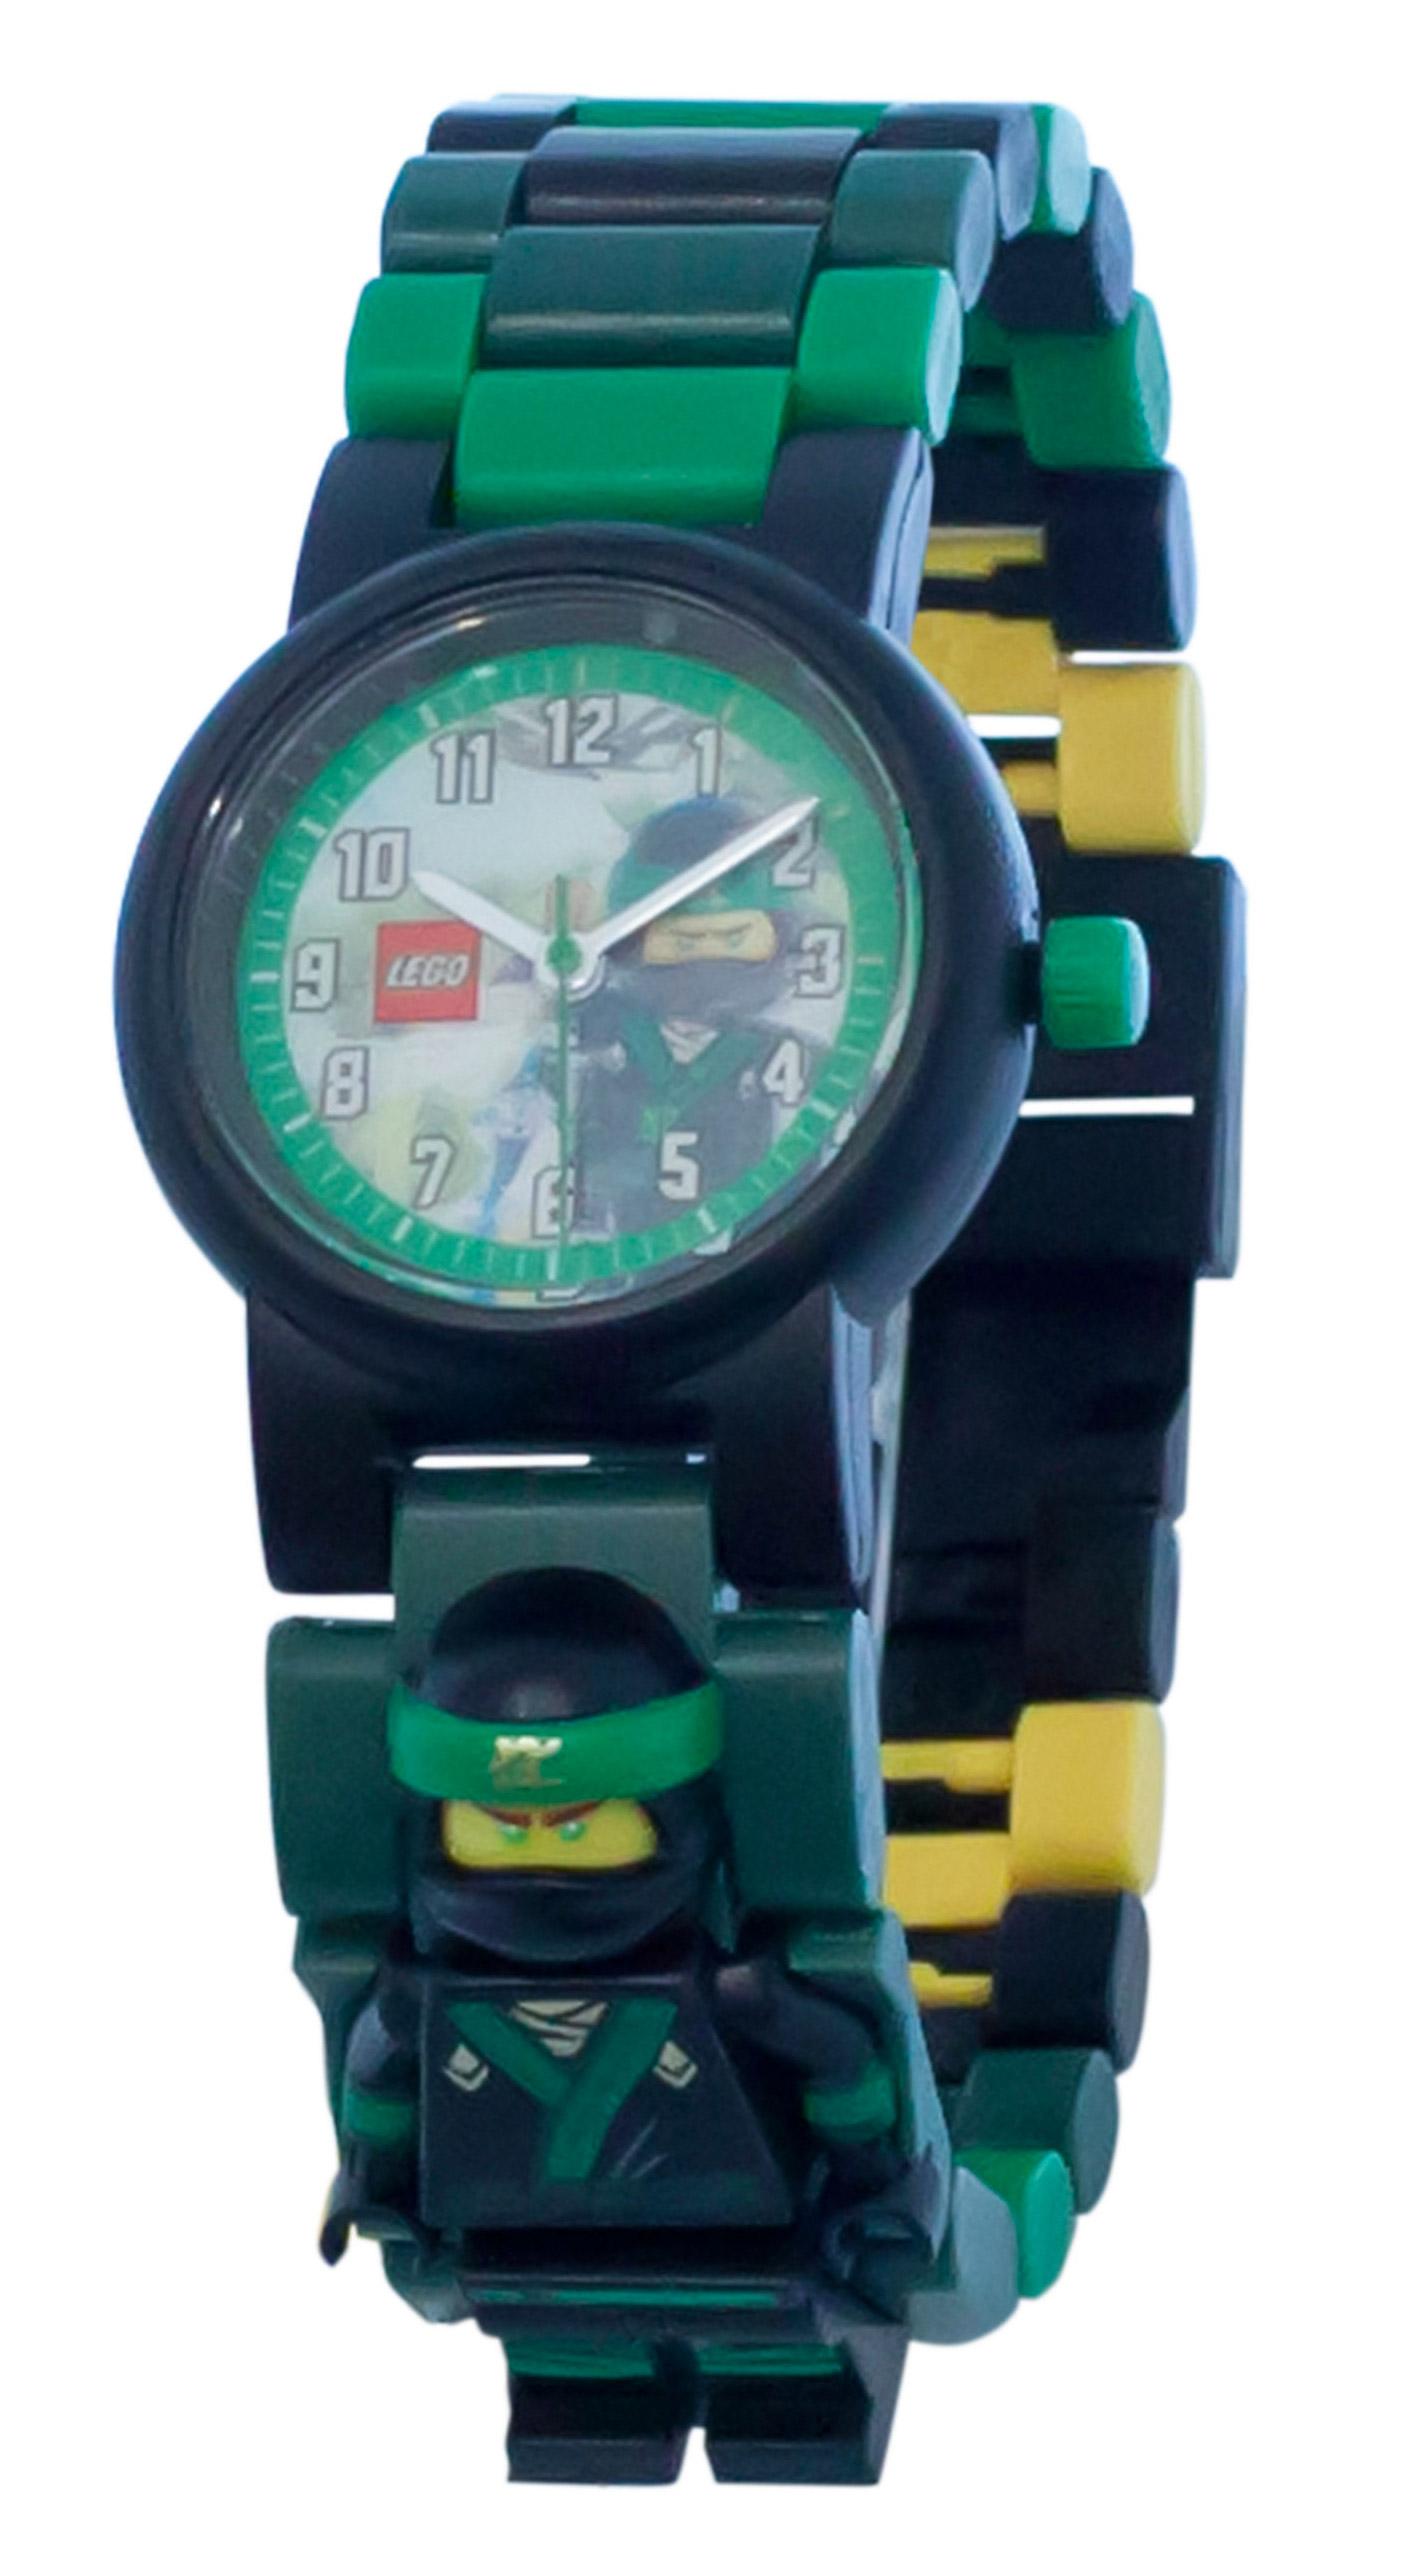 lego montres 5005370 pas cher montre bracelet figurine lloyd de lego ninjago le film. Black Bedroom Furniture Sets. Home Design Ideas